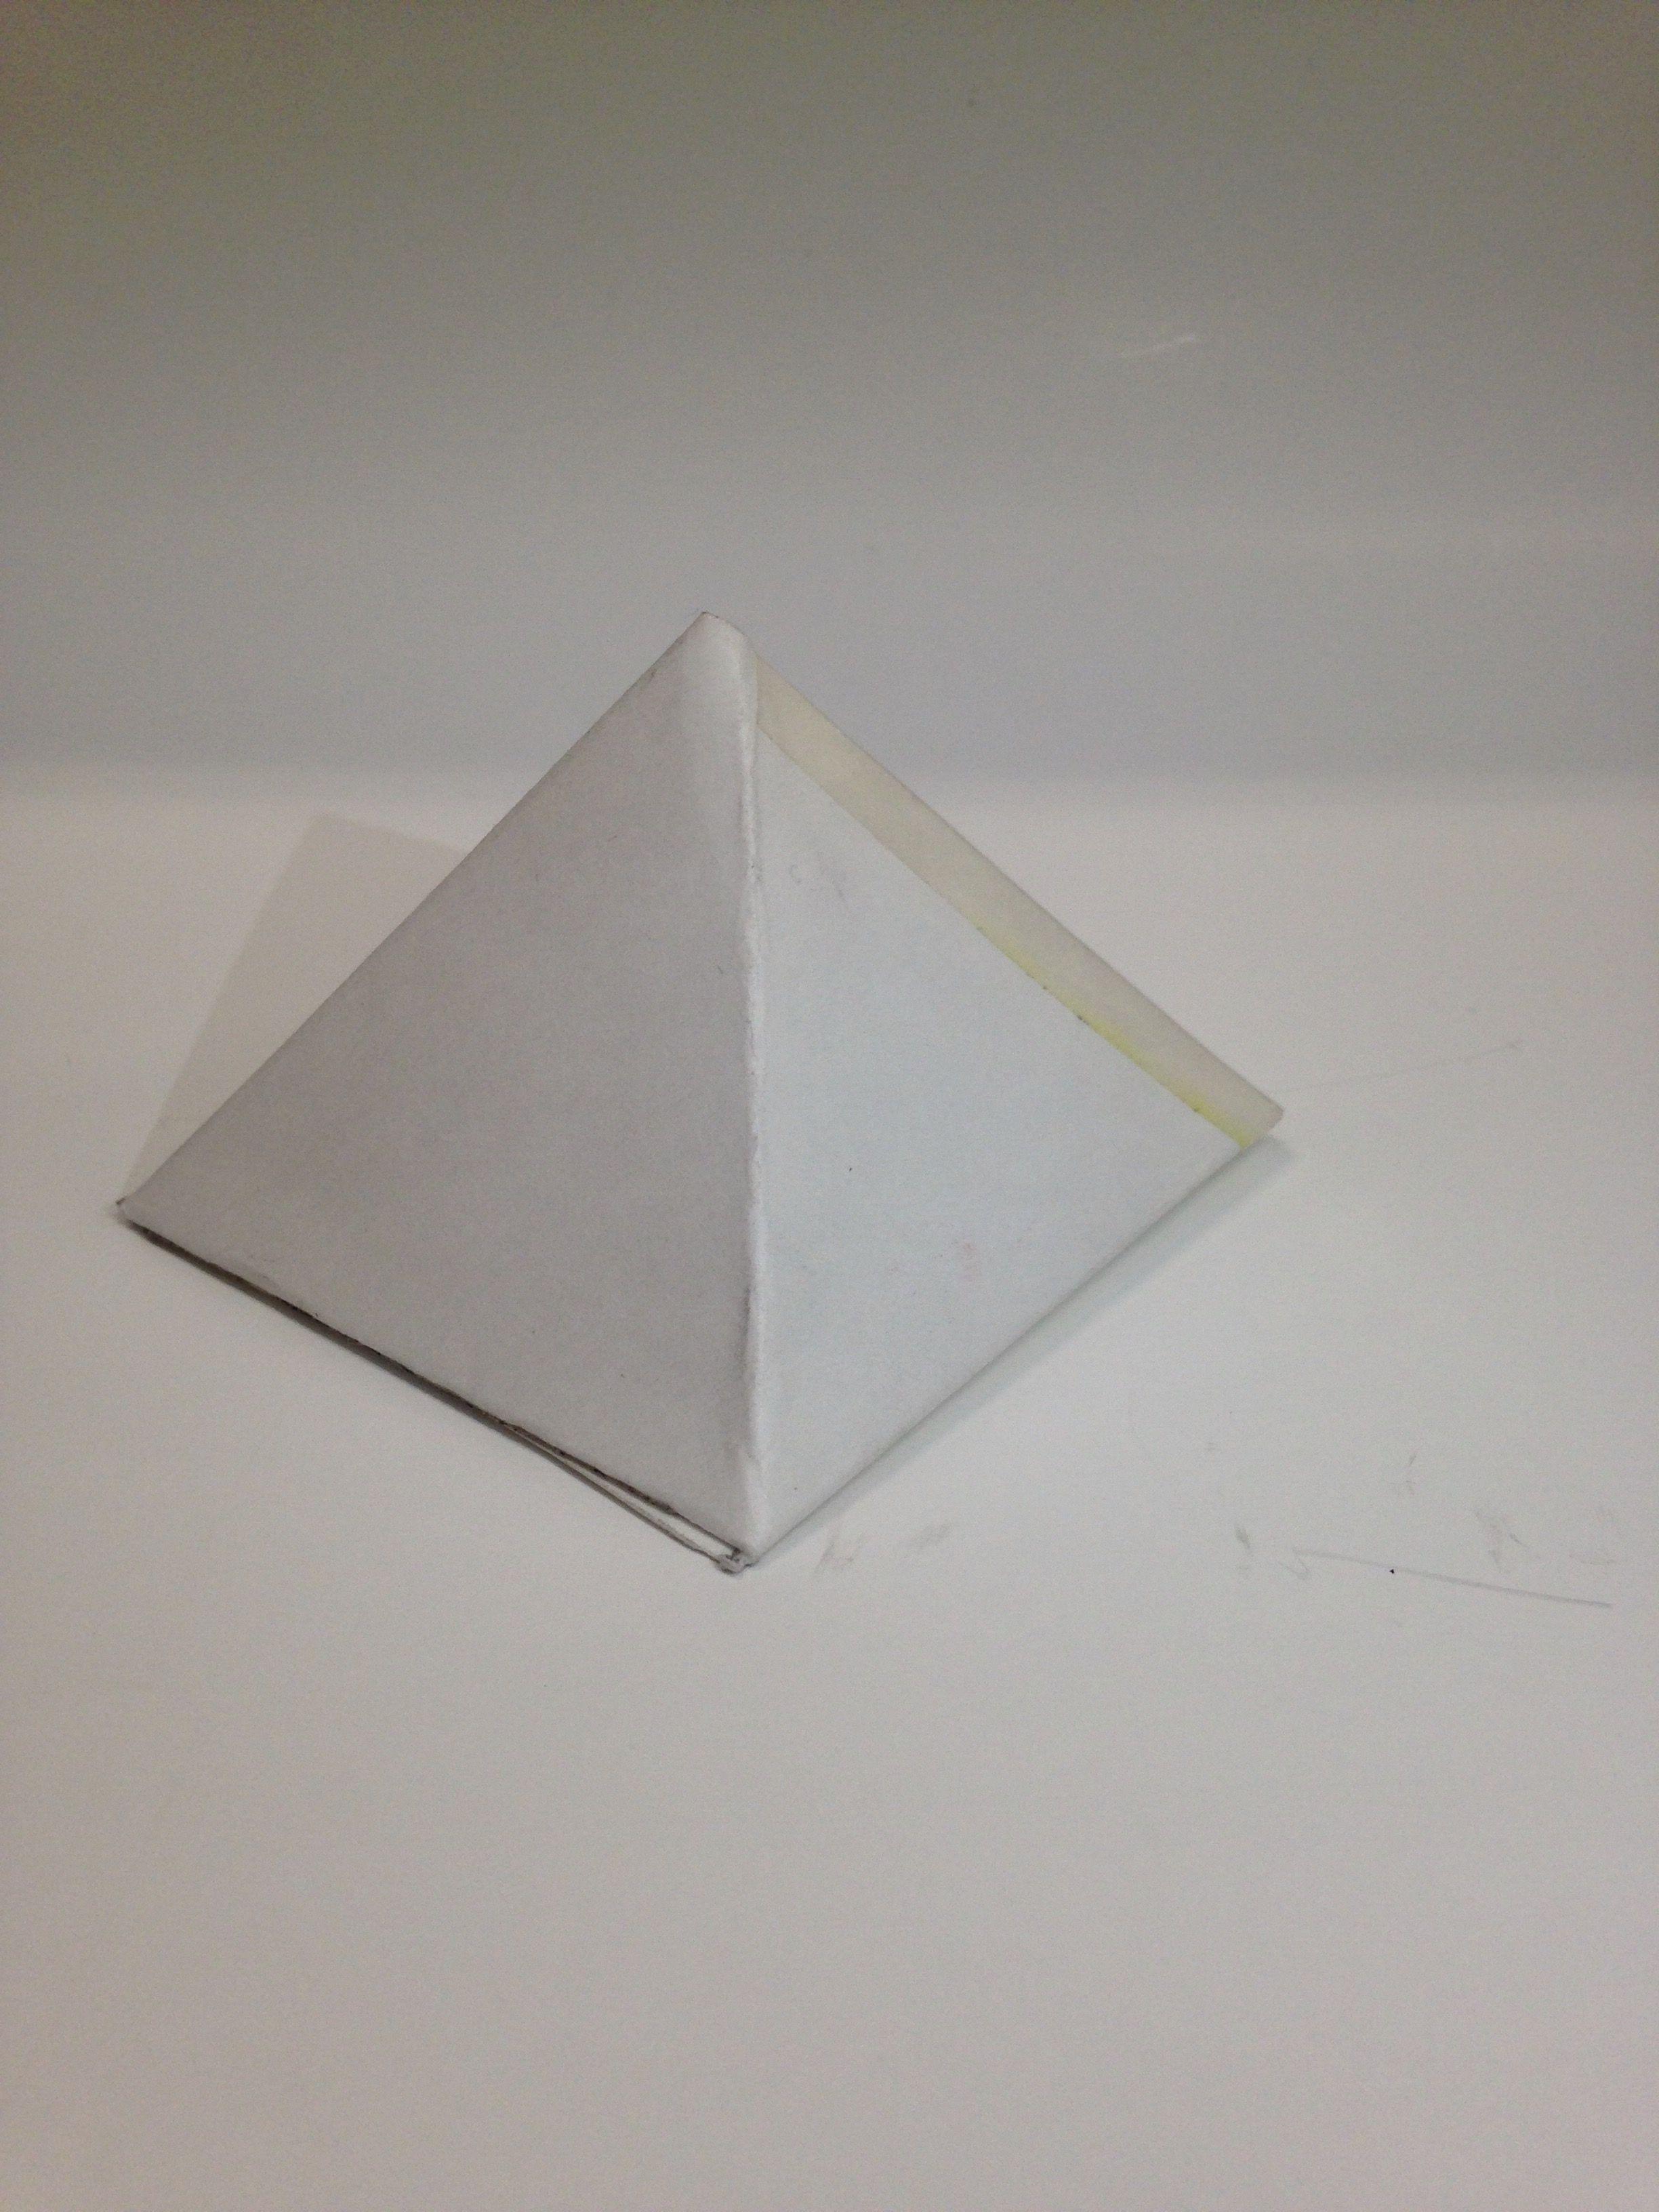 Pin by Hannah-Kate Magon on VAP1-Pyramids | Pinterest